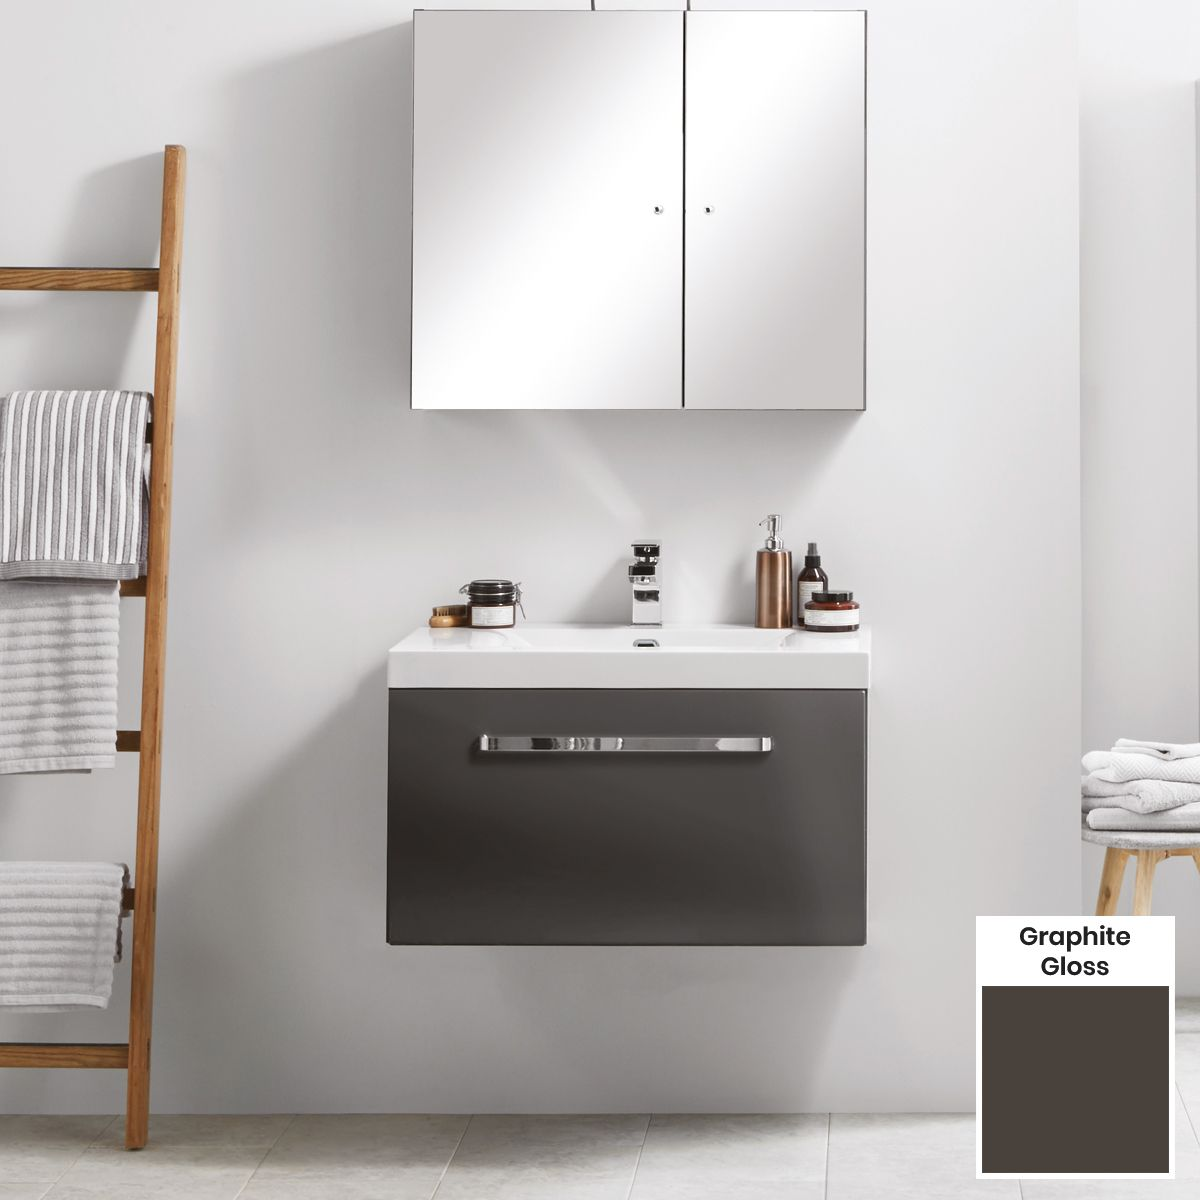 Elation Eko Graphite Gloss Vanity Unit with Slab Drawer 750mm